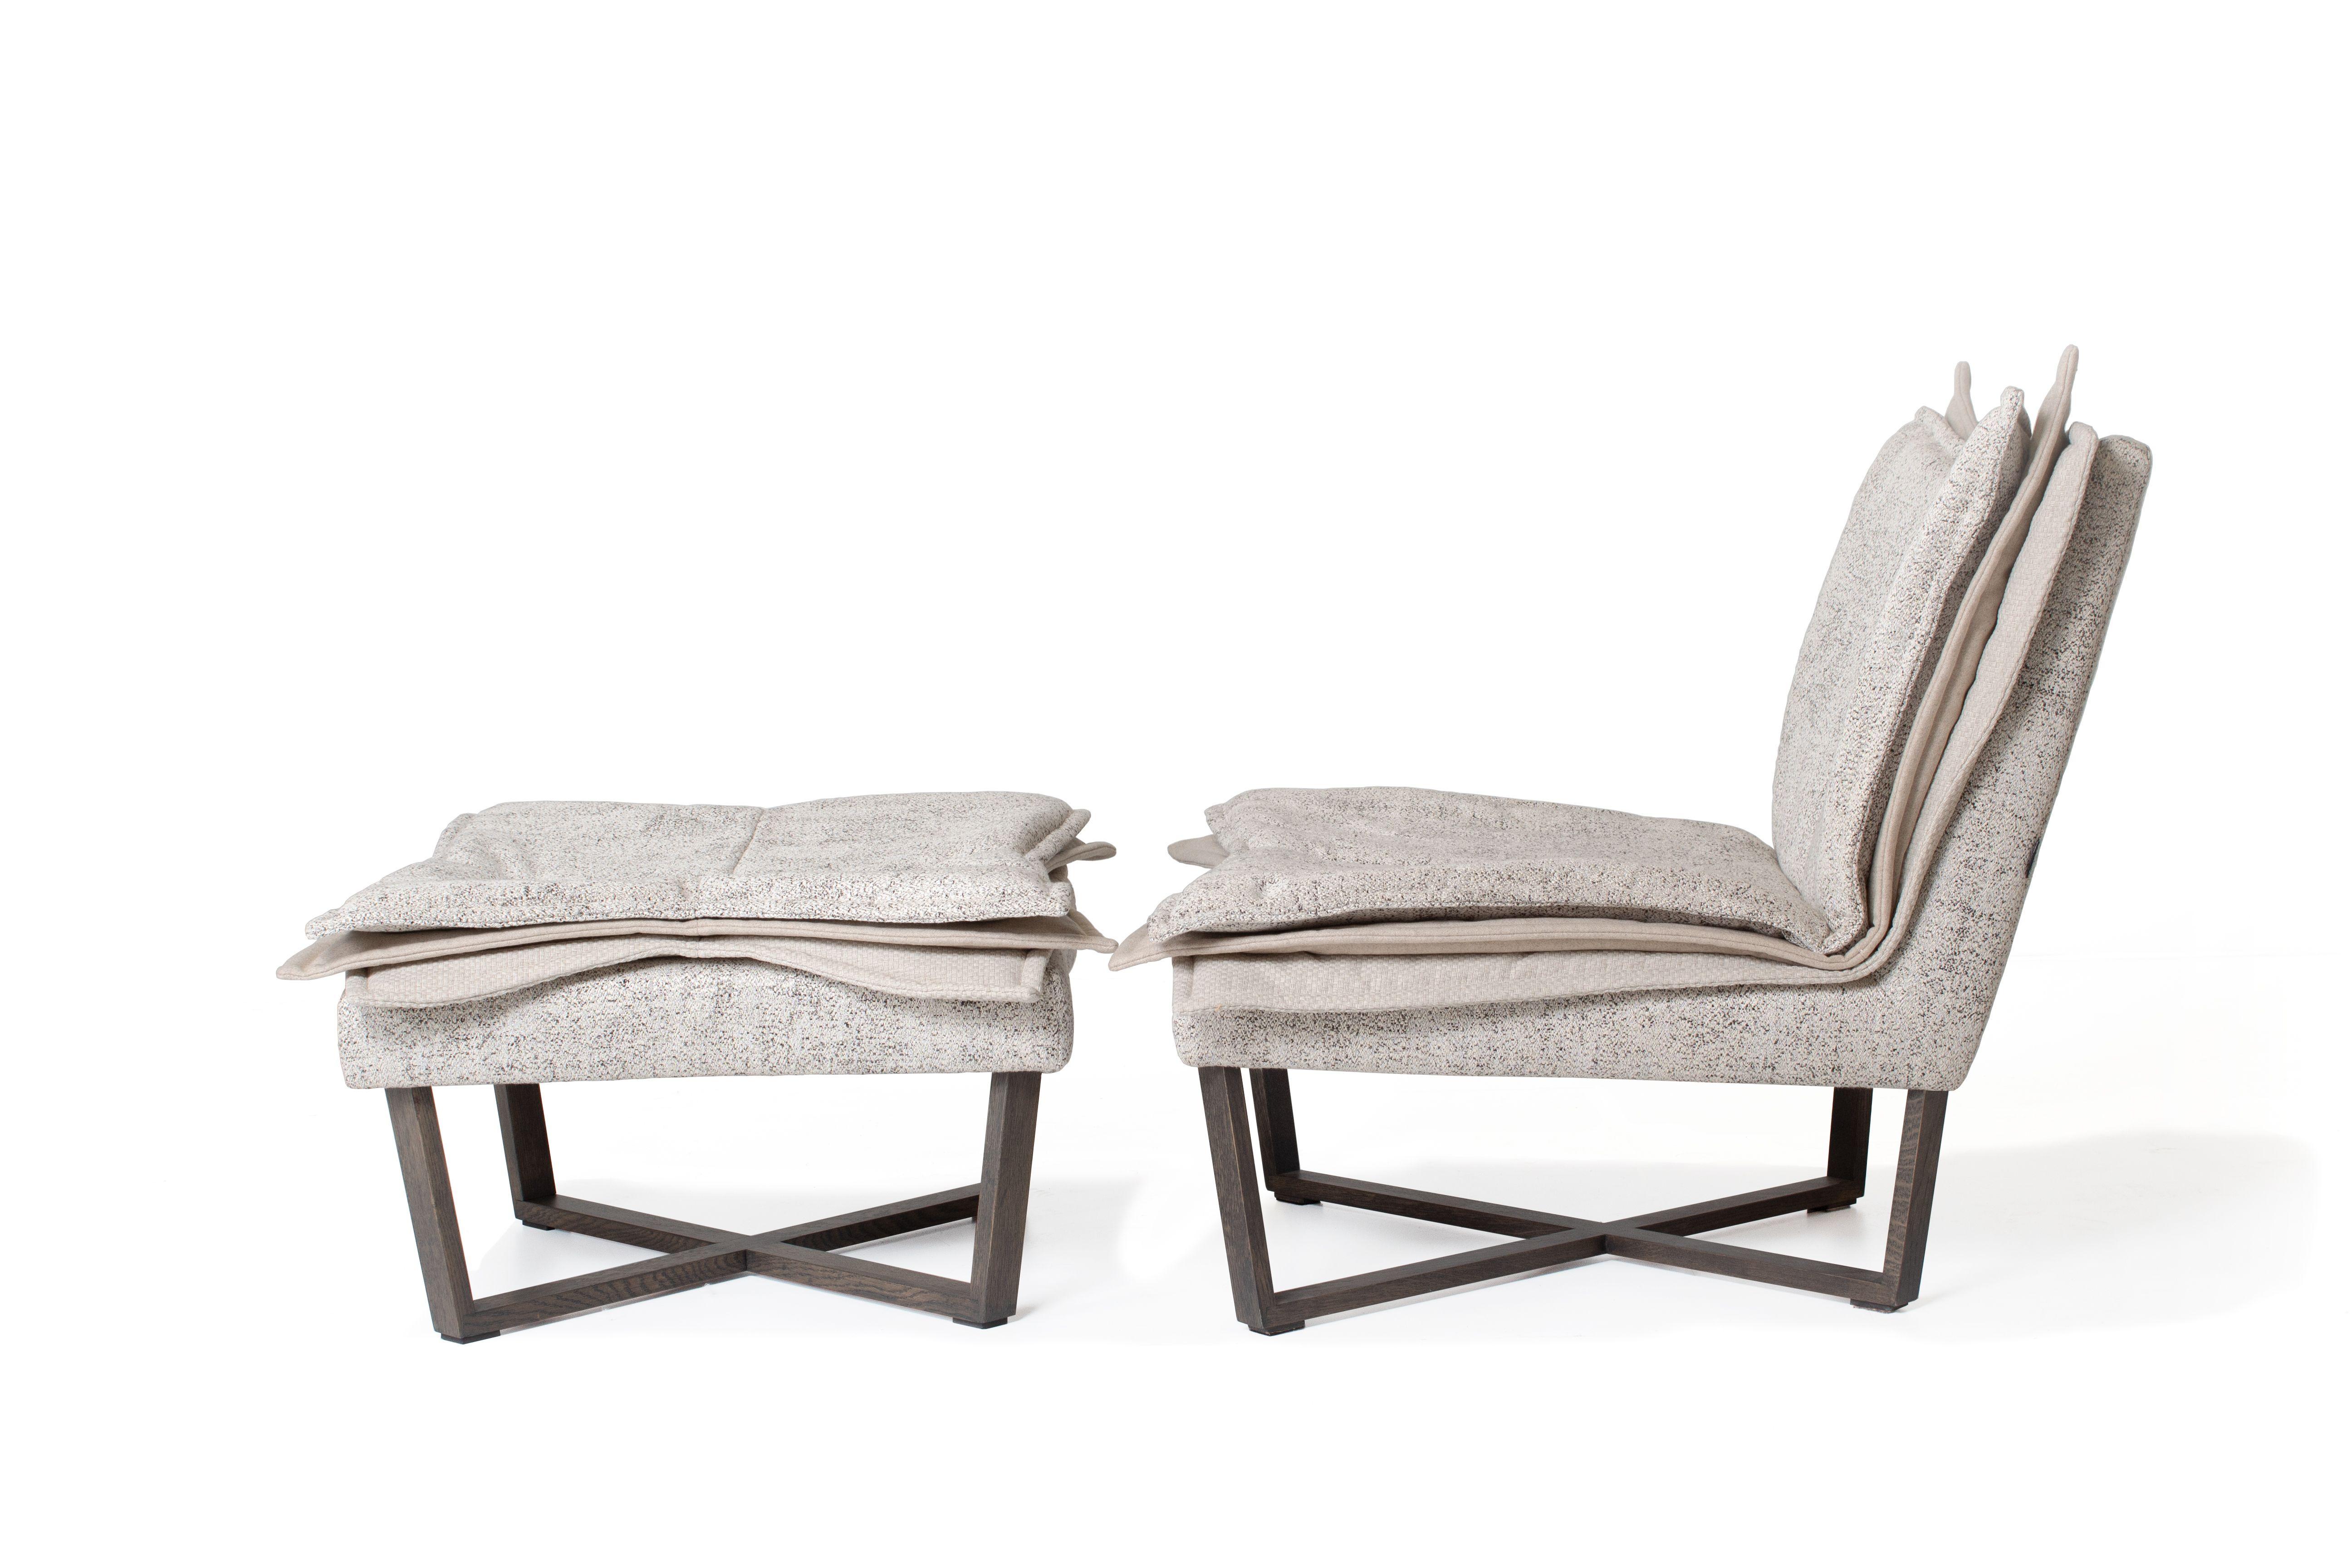 Strange Moome Our New Flo Chair Ottoman Moome Be Chair Short Links Chair Design For Home Short Linksinfo